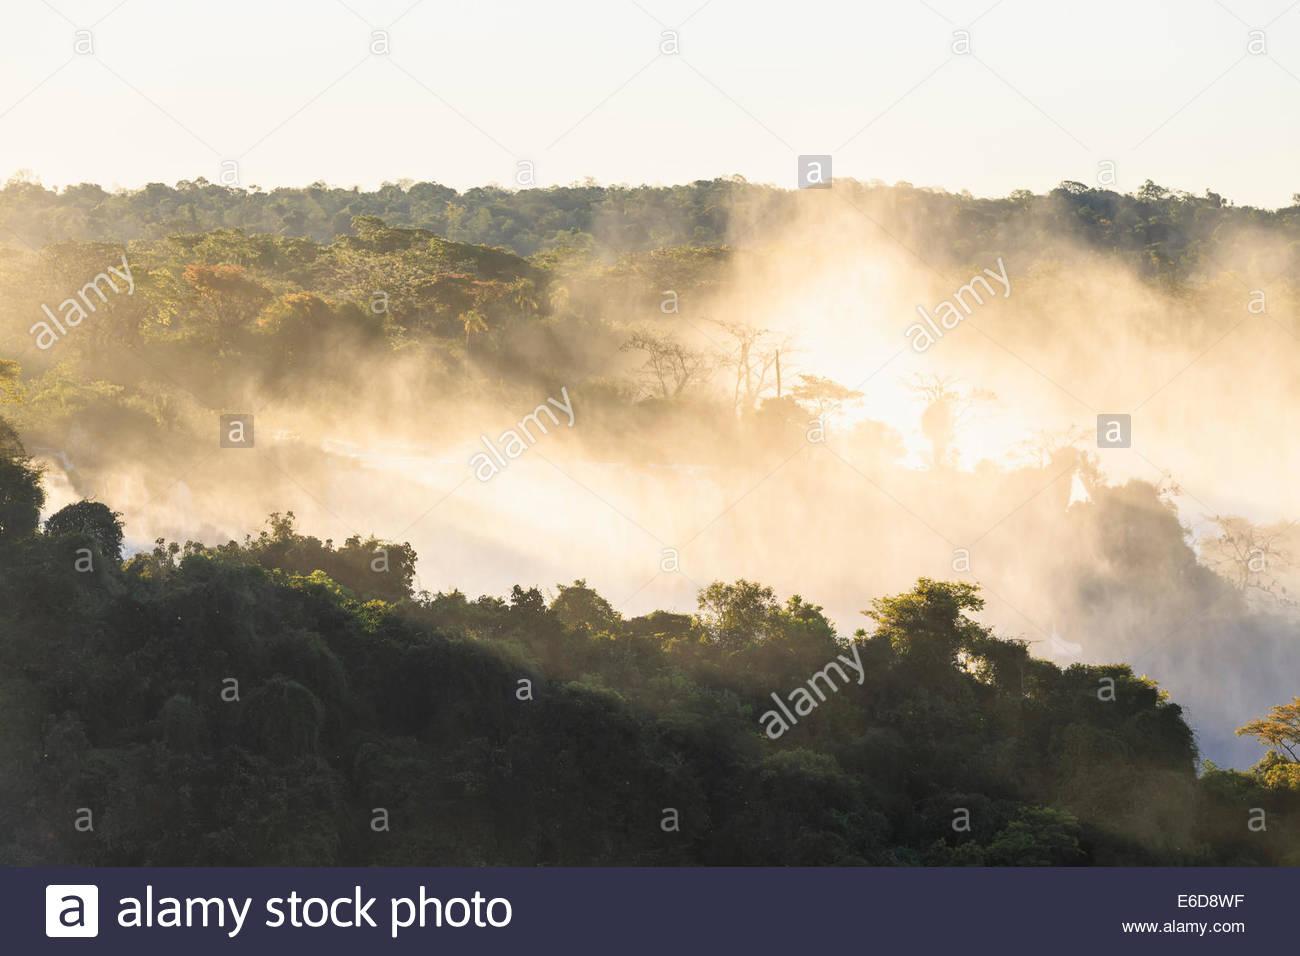 South America, Brazil, Parana, Iguazu National Park, Iguazu Falls, Forest and water vapour - Stock Image